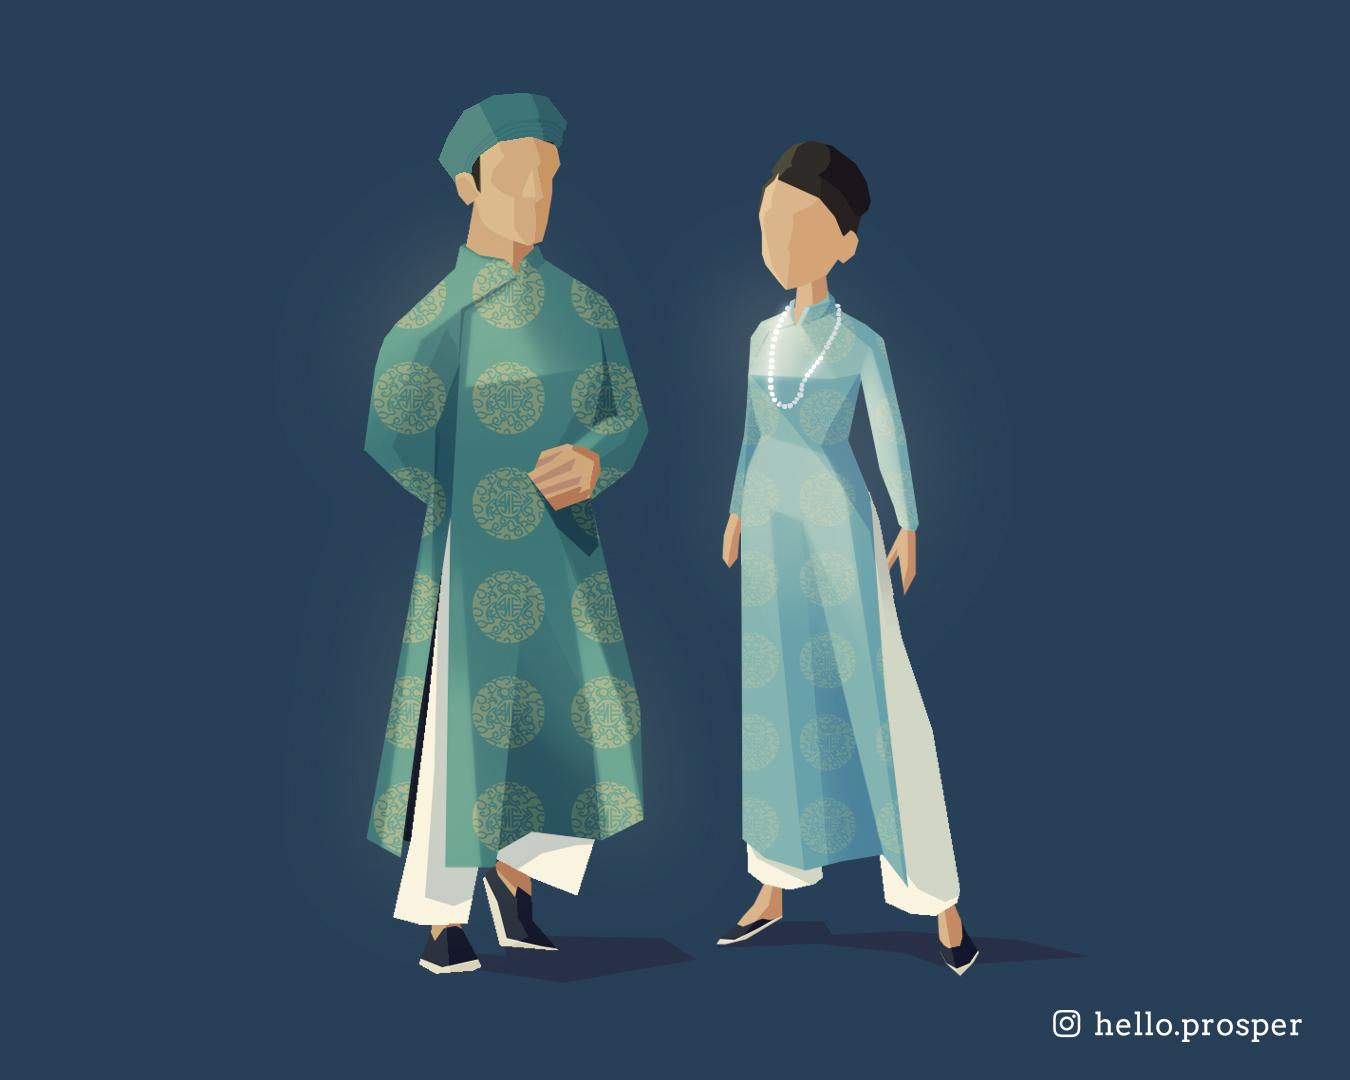 Hello Prosper teal ao dai male female illustration